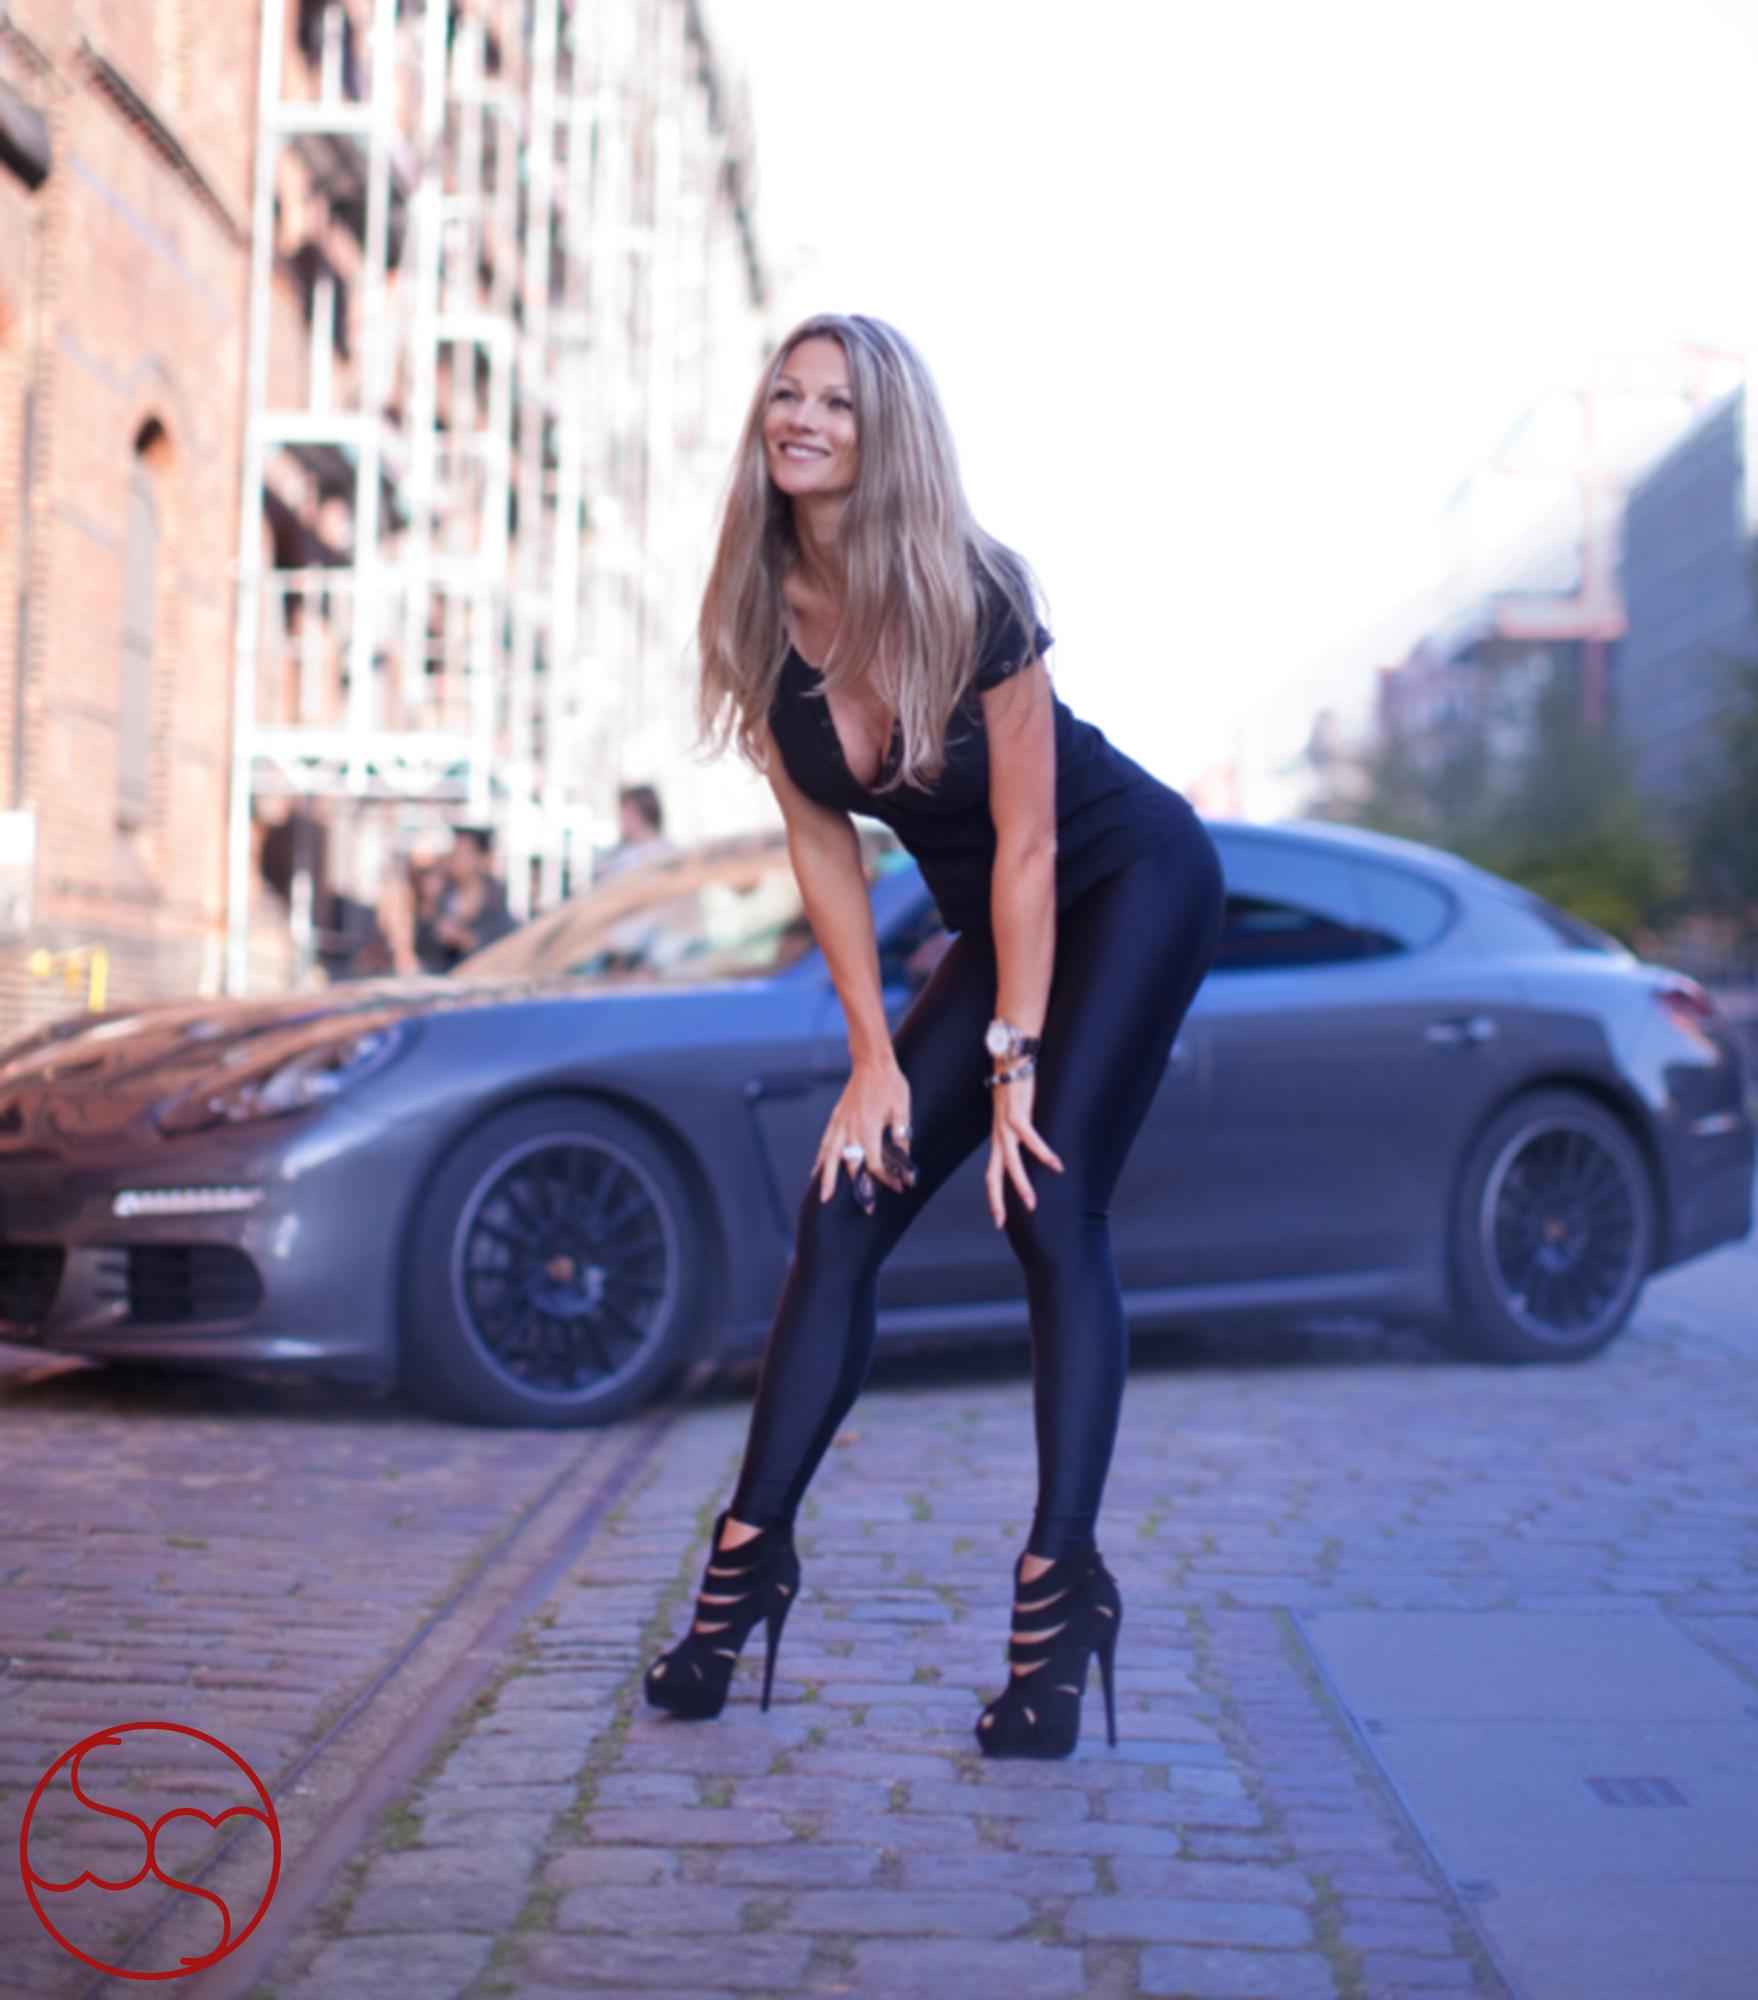 fametastic female by sandra faas - woman entrepreneur